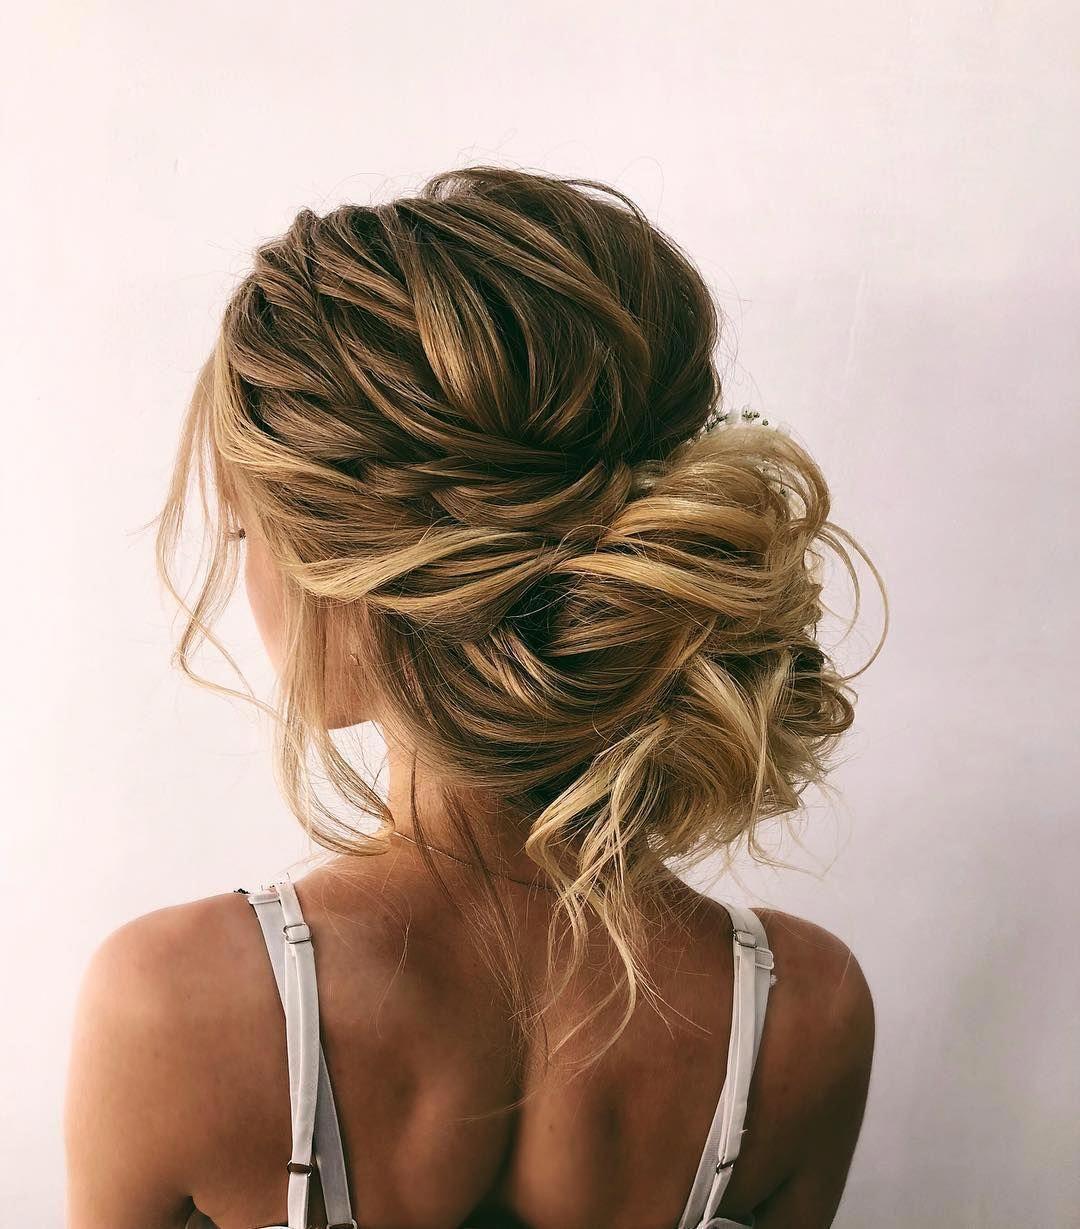 Easy Formal Hairstyles For Medium Hair Upstyles For Medium Hair Going Out Updo Styles 20190613 Eas Hair Styles Easy Formal Hairstyles Medium Hair Upstyles